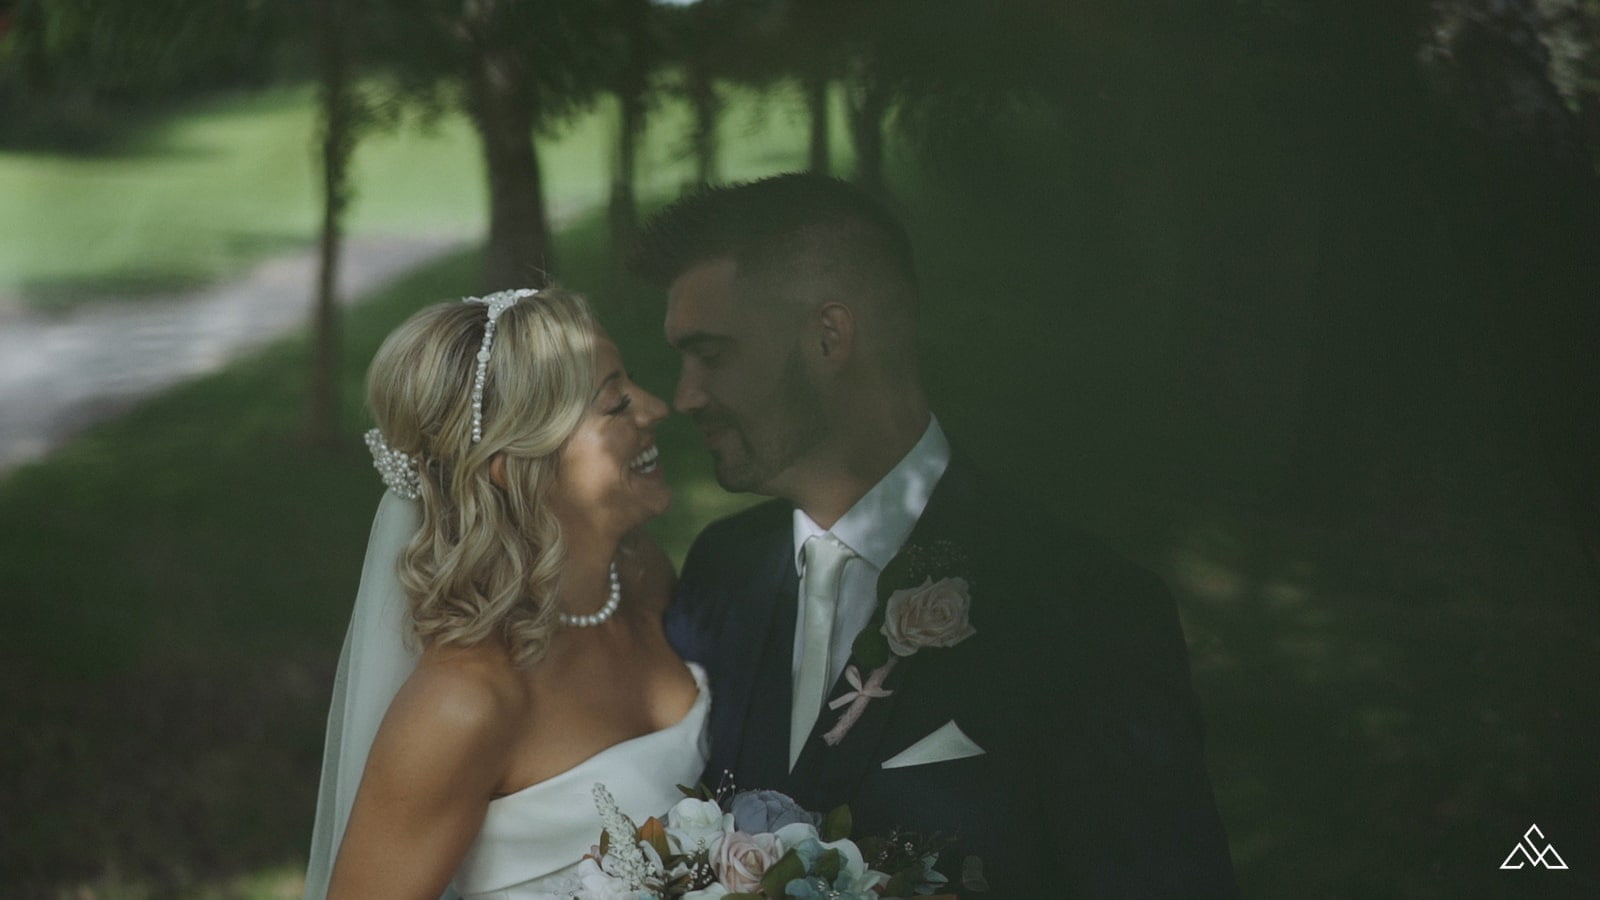 Barnham Broom Wedding Video Victoria and Toby